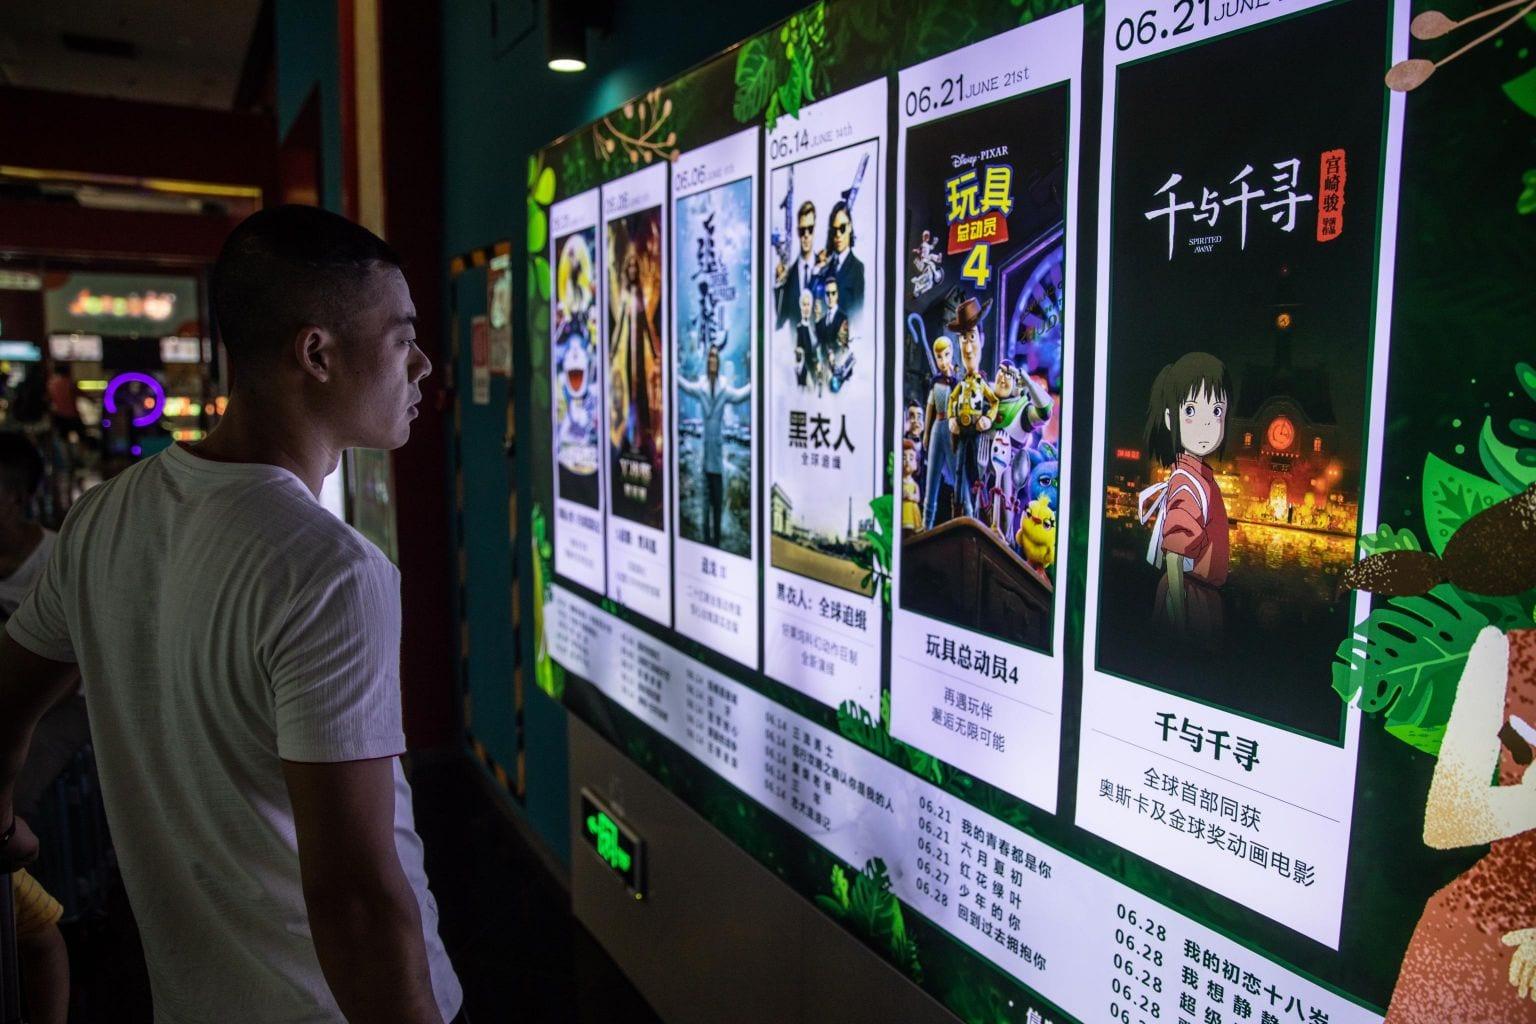 Chinese box office